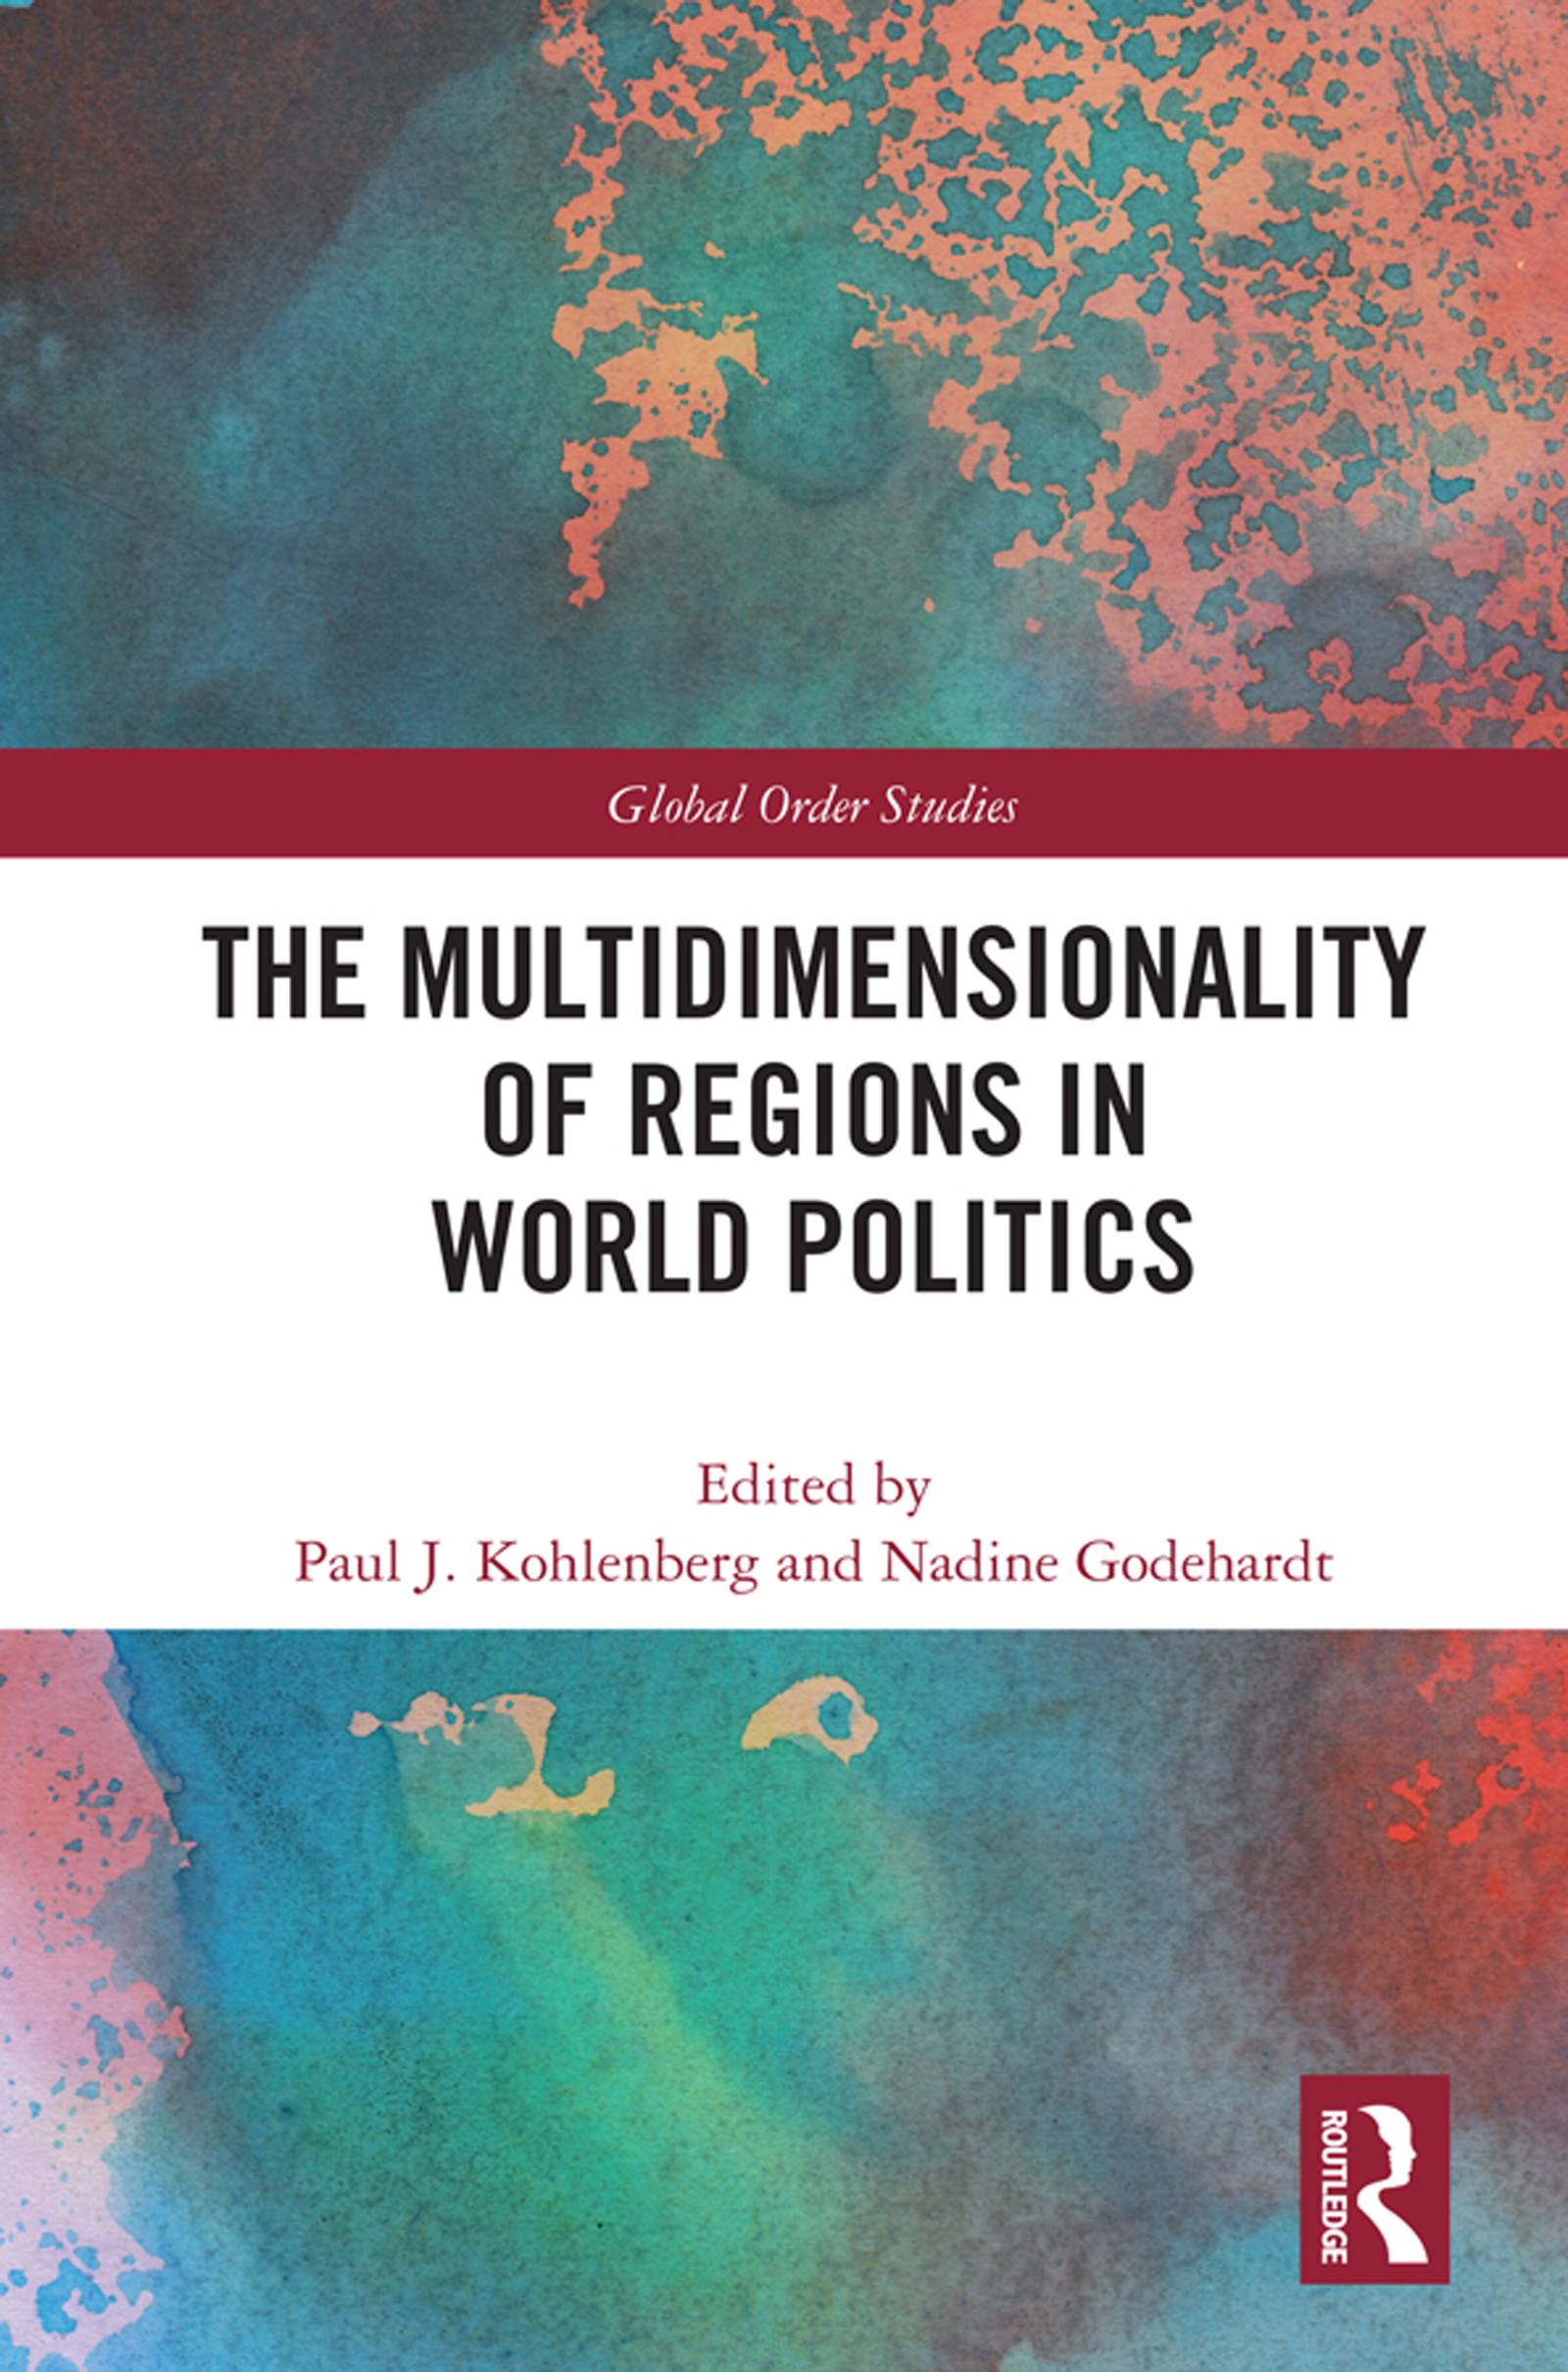 The Multidimensionality of Regions in World Politics